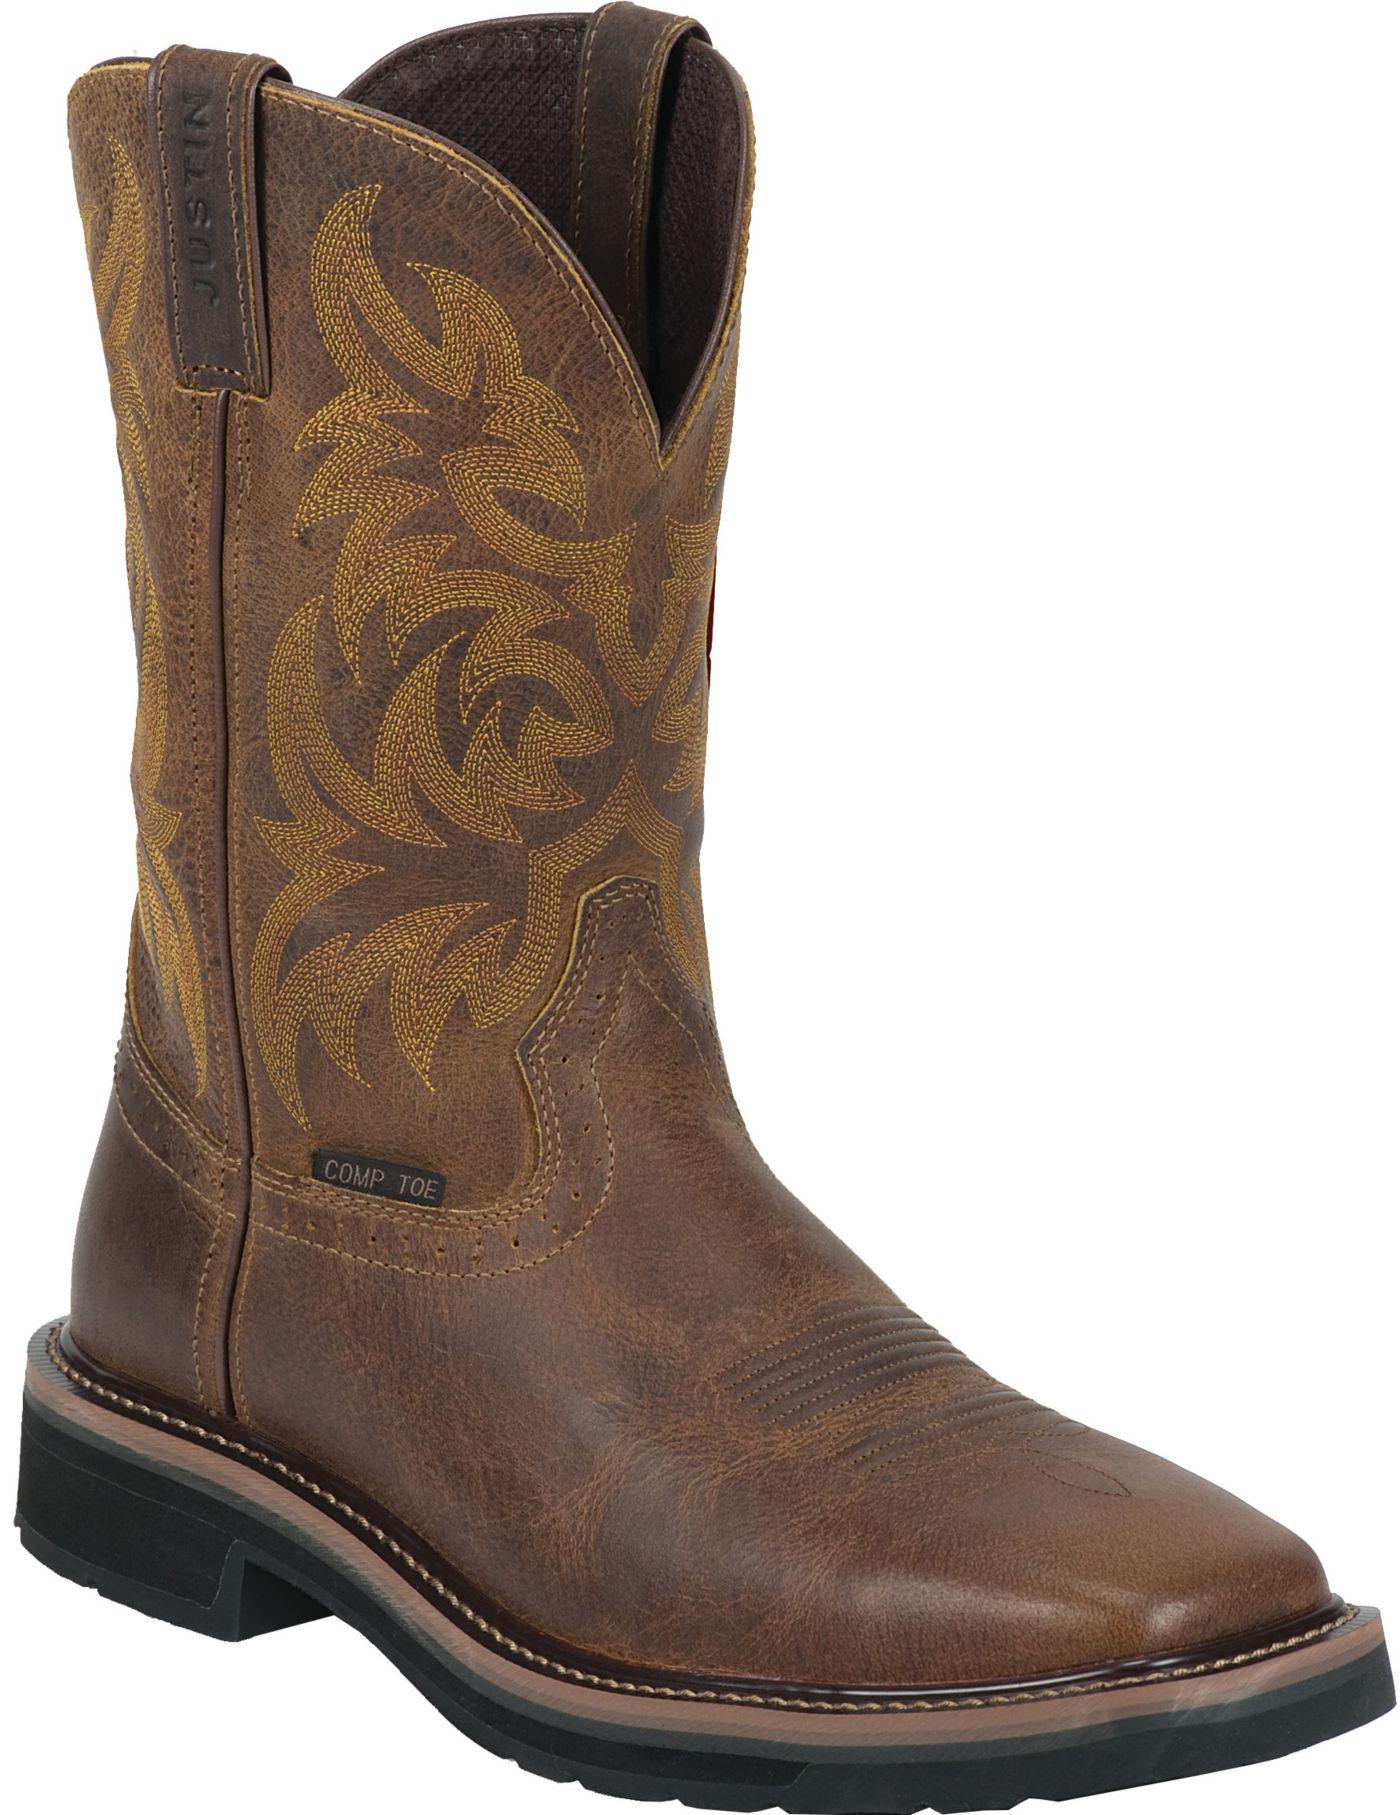 Justin Men's Handler Composite Toe Western Work Boots